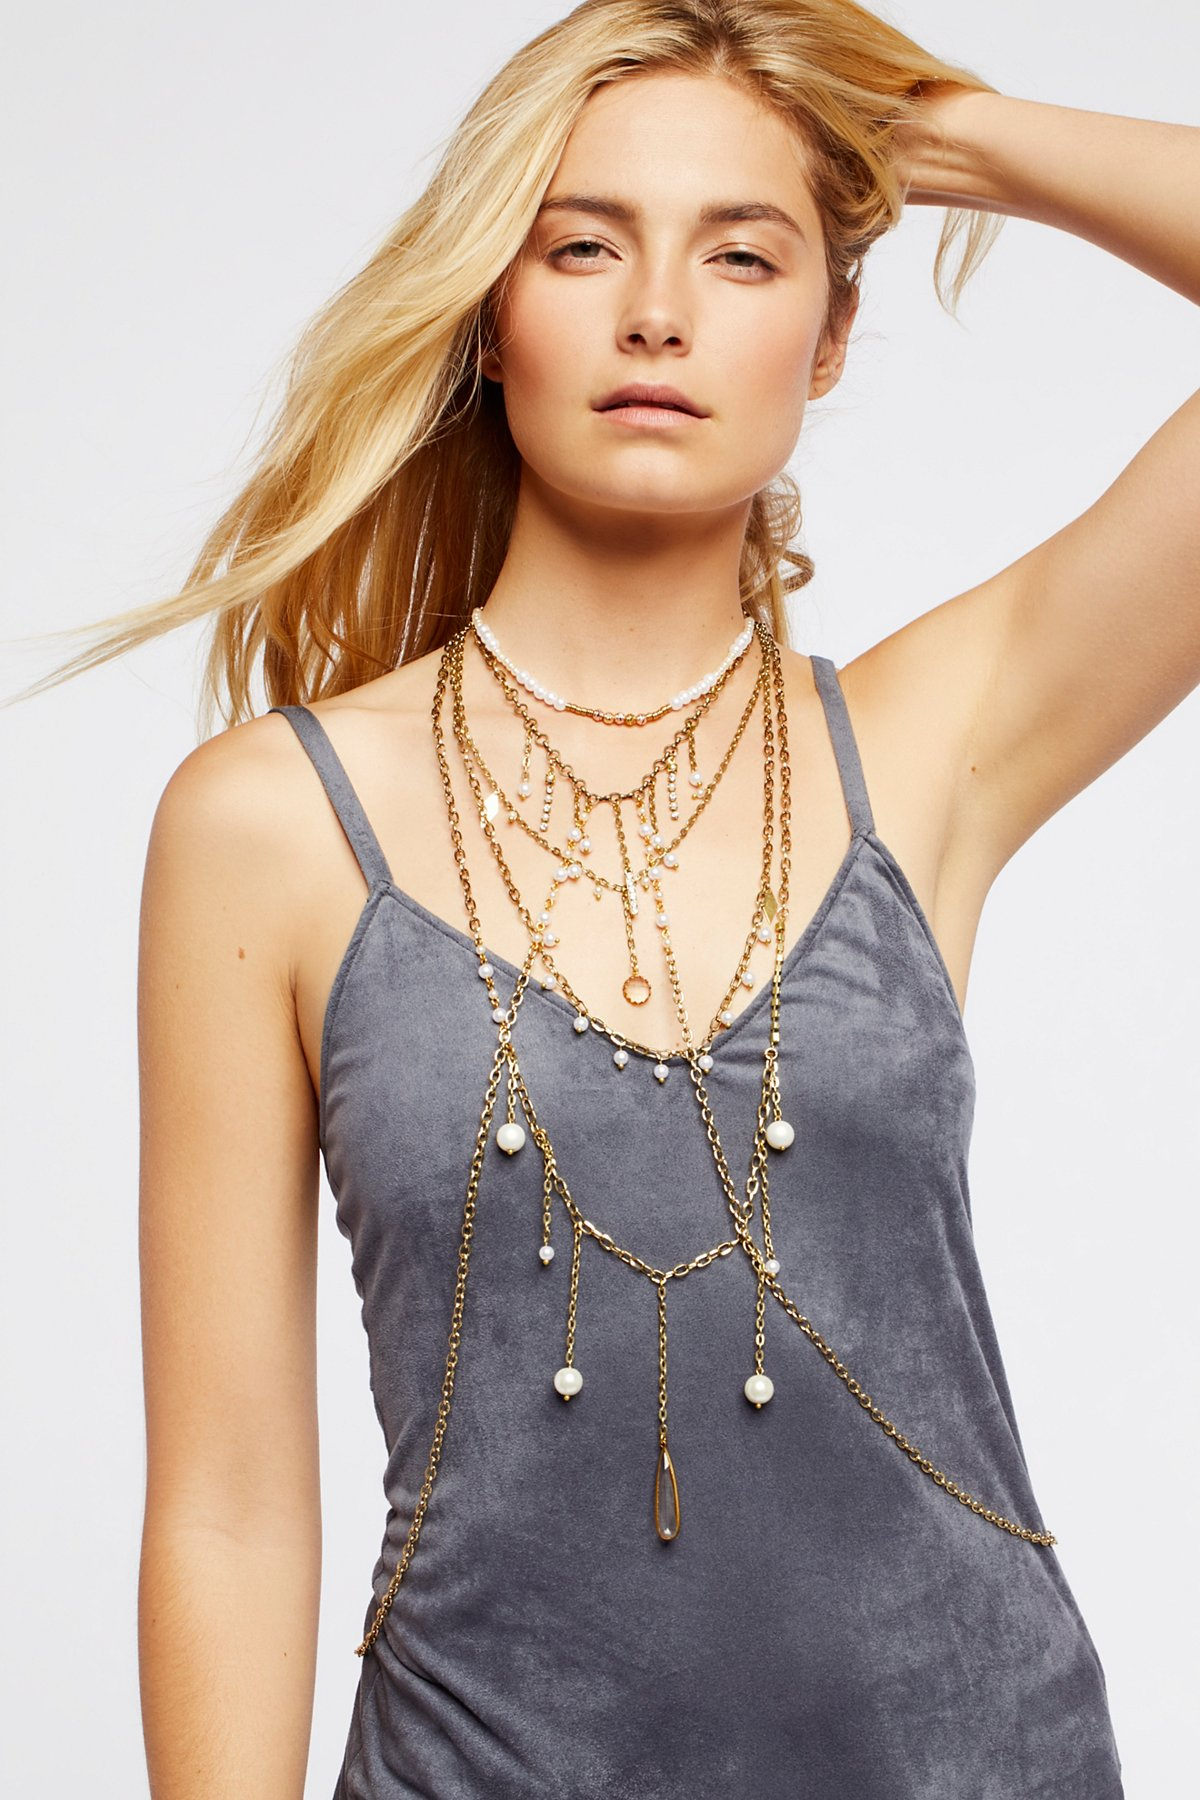 Dripping in Pearls项链